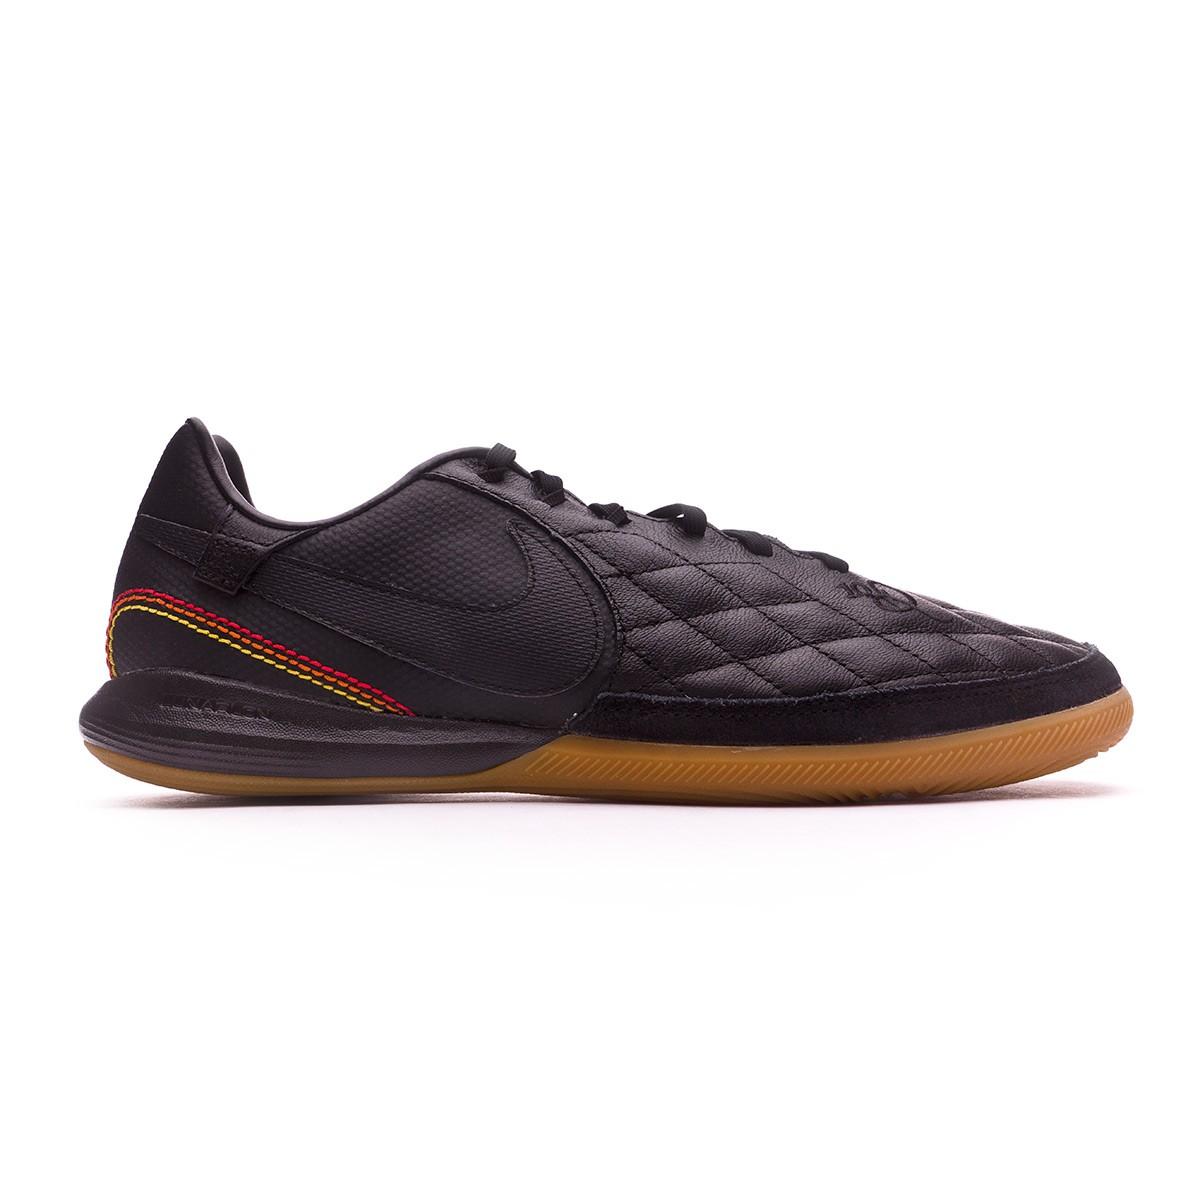 afd1154750 Sapatilha de Futsal Nike TiempoX Finale 10R Paris IC Black-Metallic gold -  Loja de futebol Fútbol Emotion